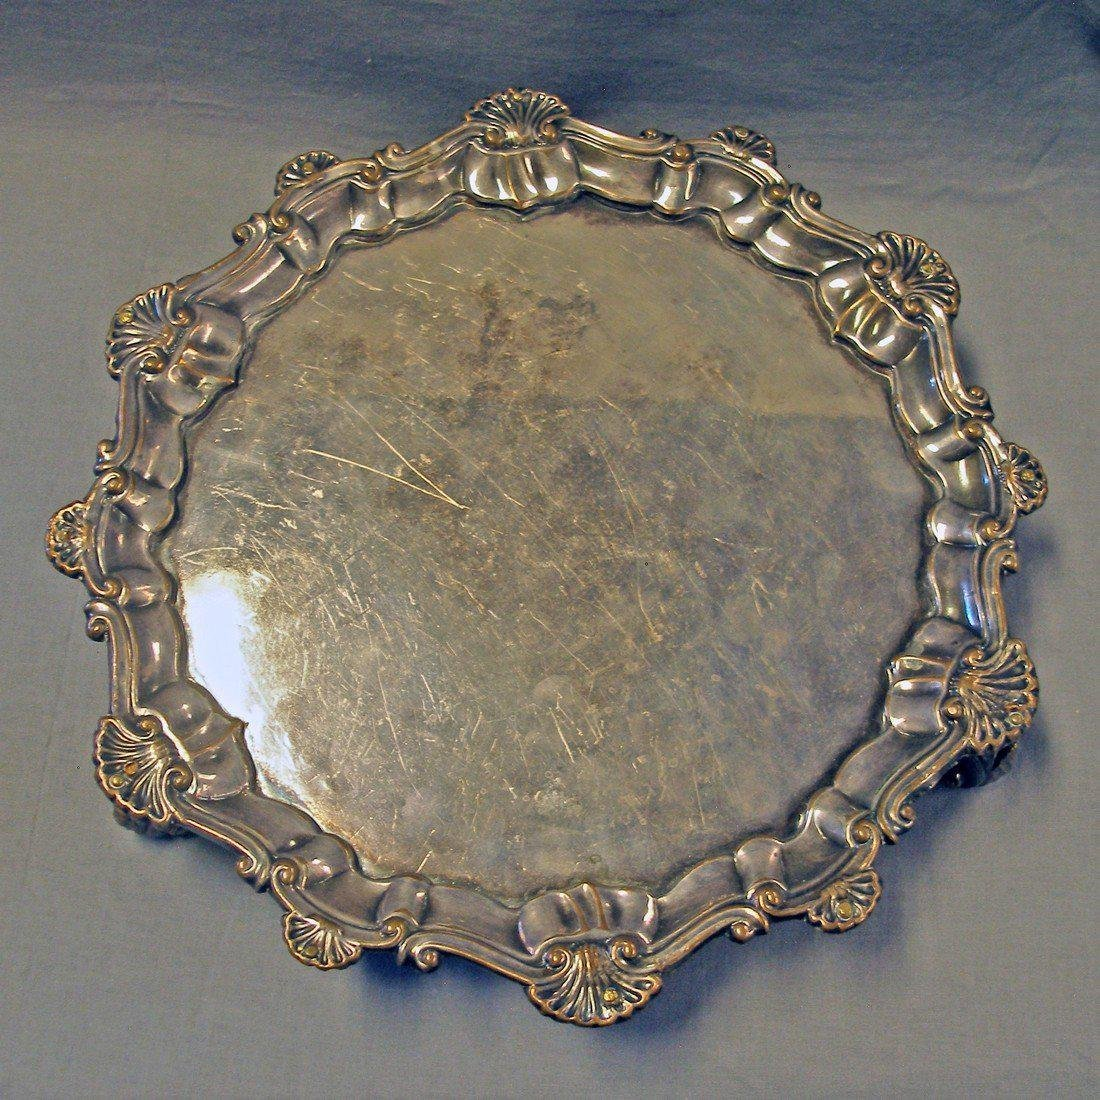 Antique Sheffield Plate Salver, c1770